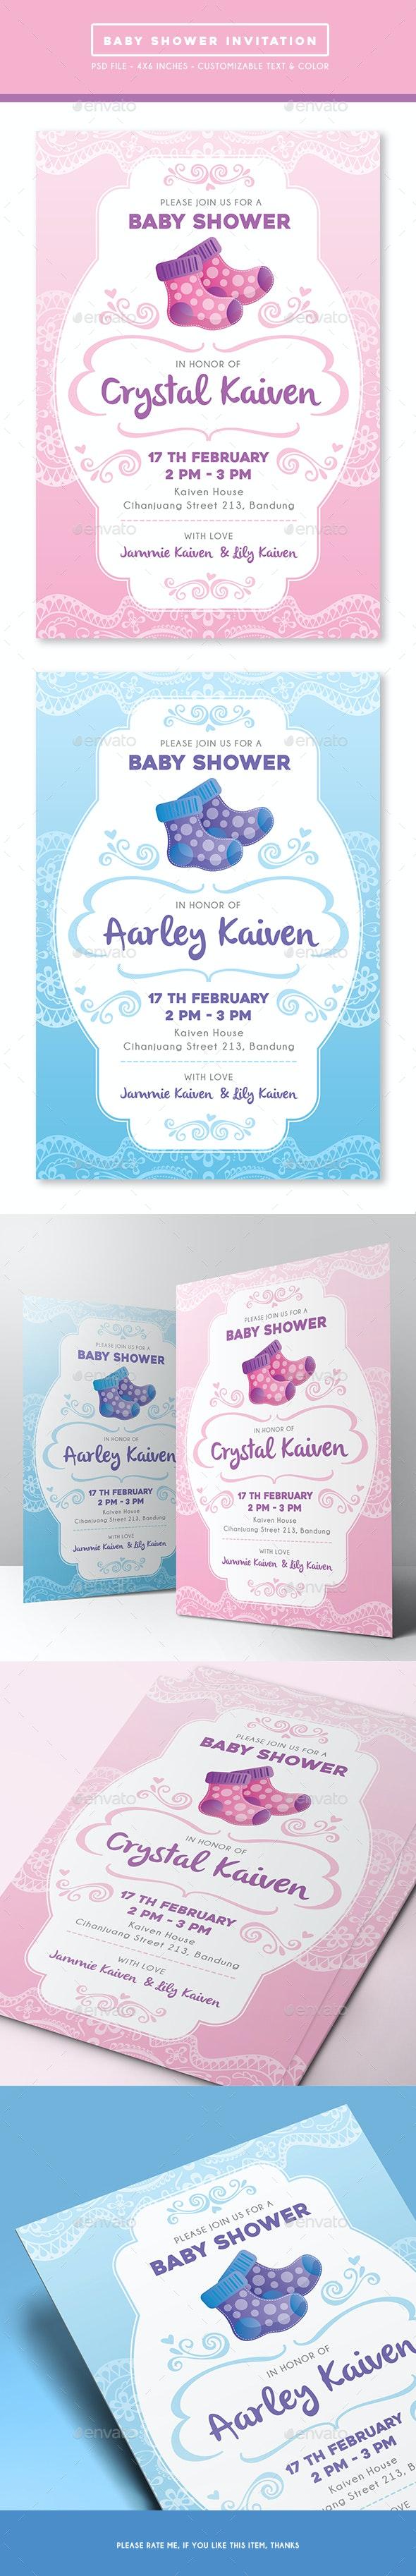 Baby Shower Invitation - Invitations Cards & Invites